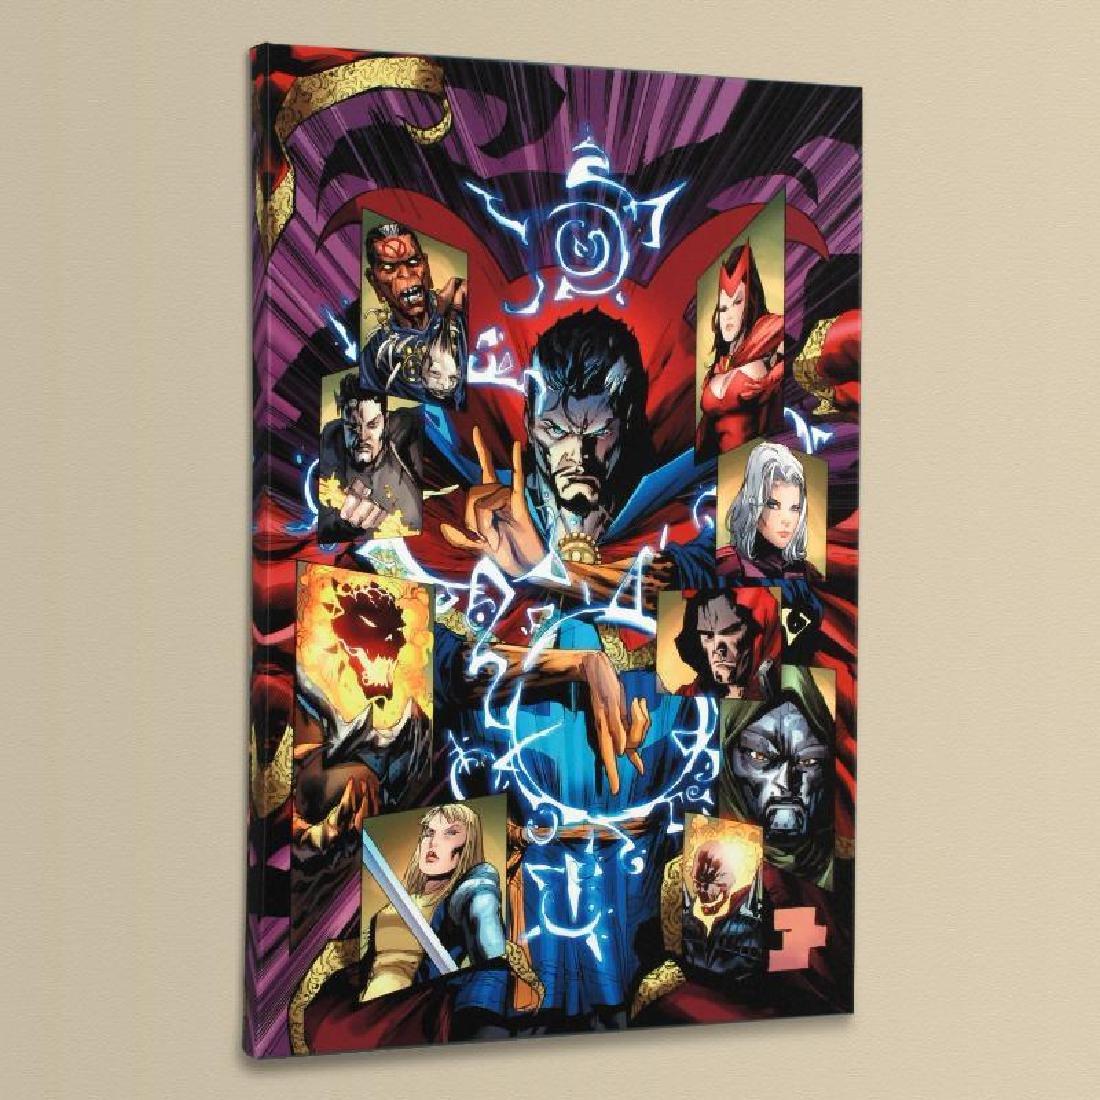 New Avengers #51 by Marvel Comics - 3